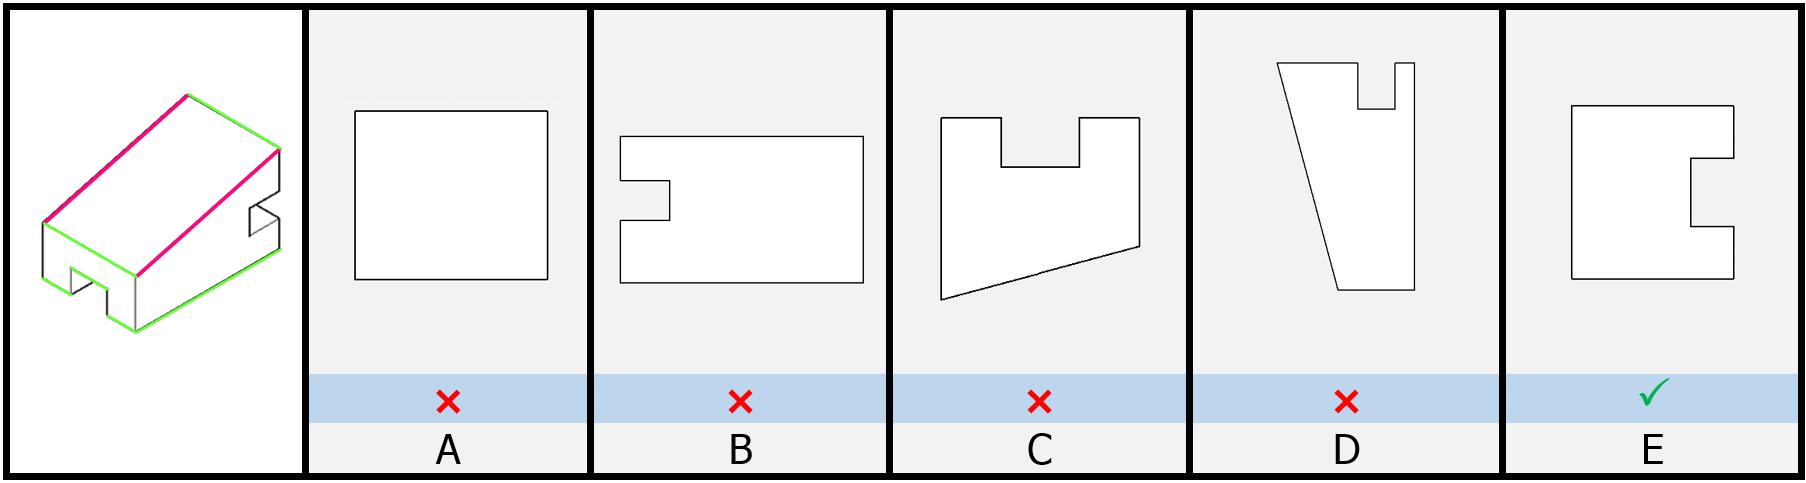 Keyhole_sample8